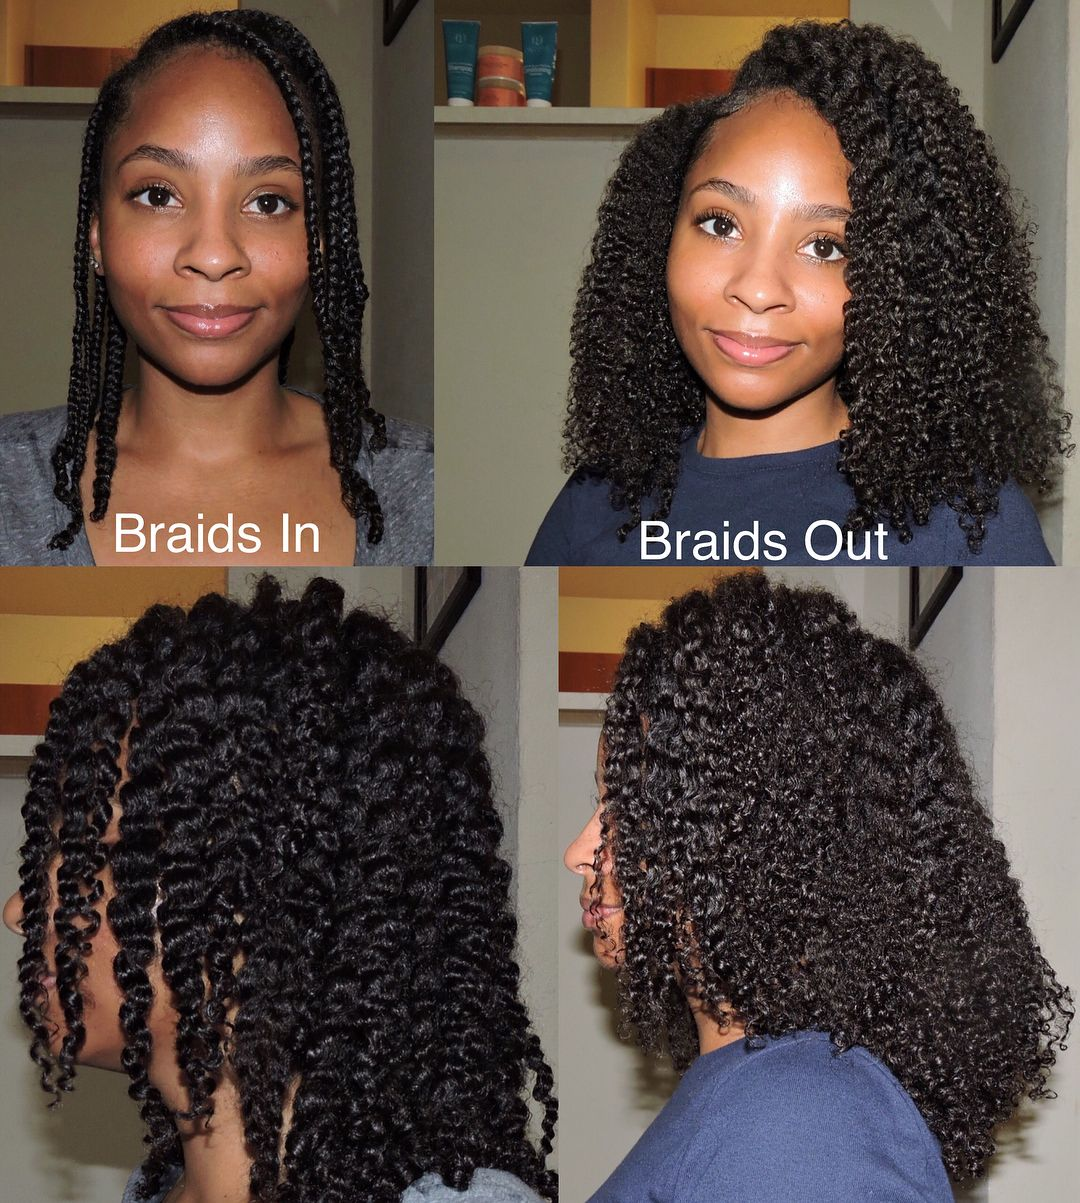 Follow Lavishcoils For More Natural Hair Pins Natural Hair Style Braid Out Natural Hair Hair Styles Braids For Short Hair